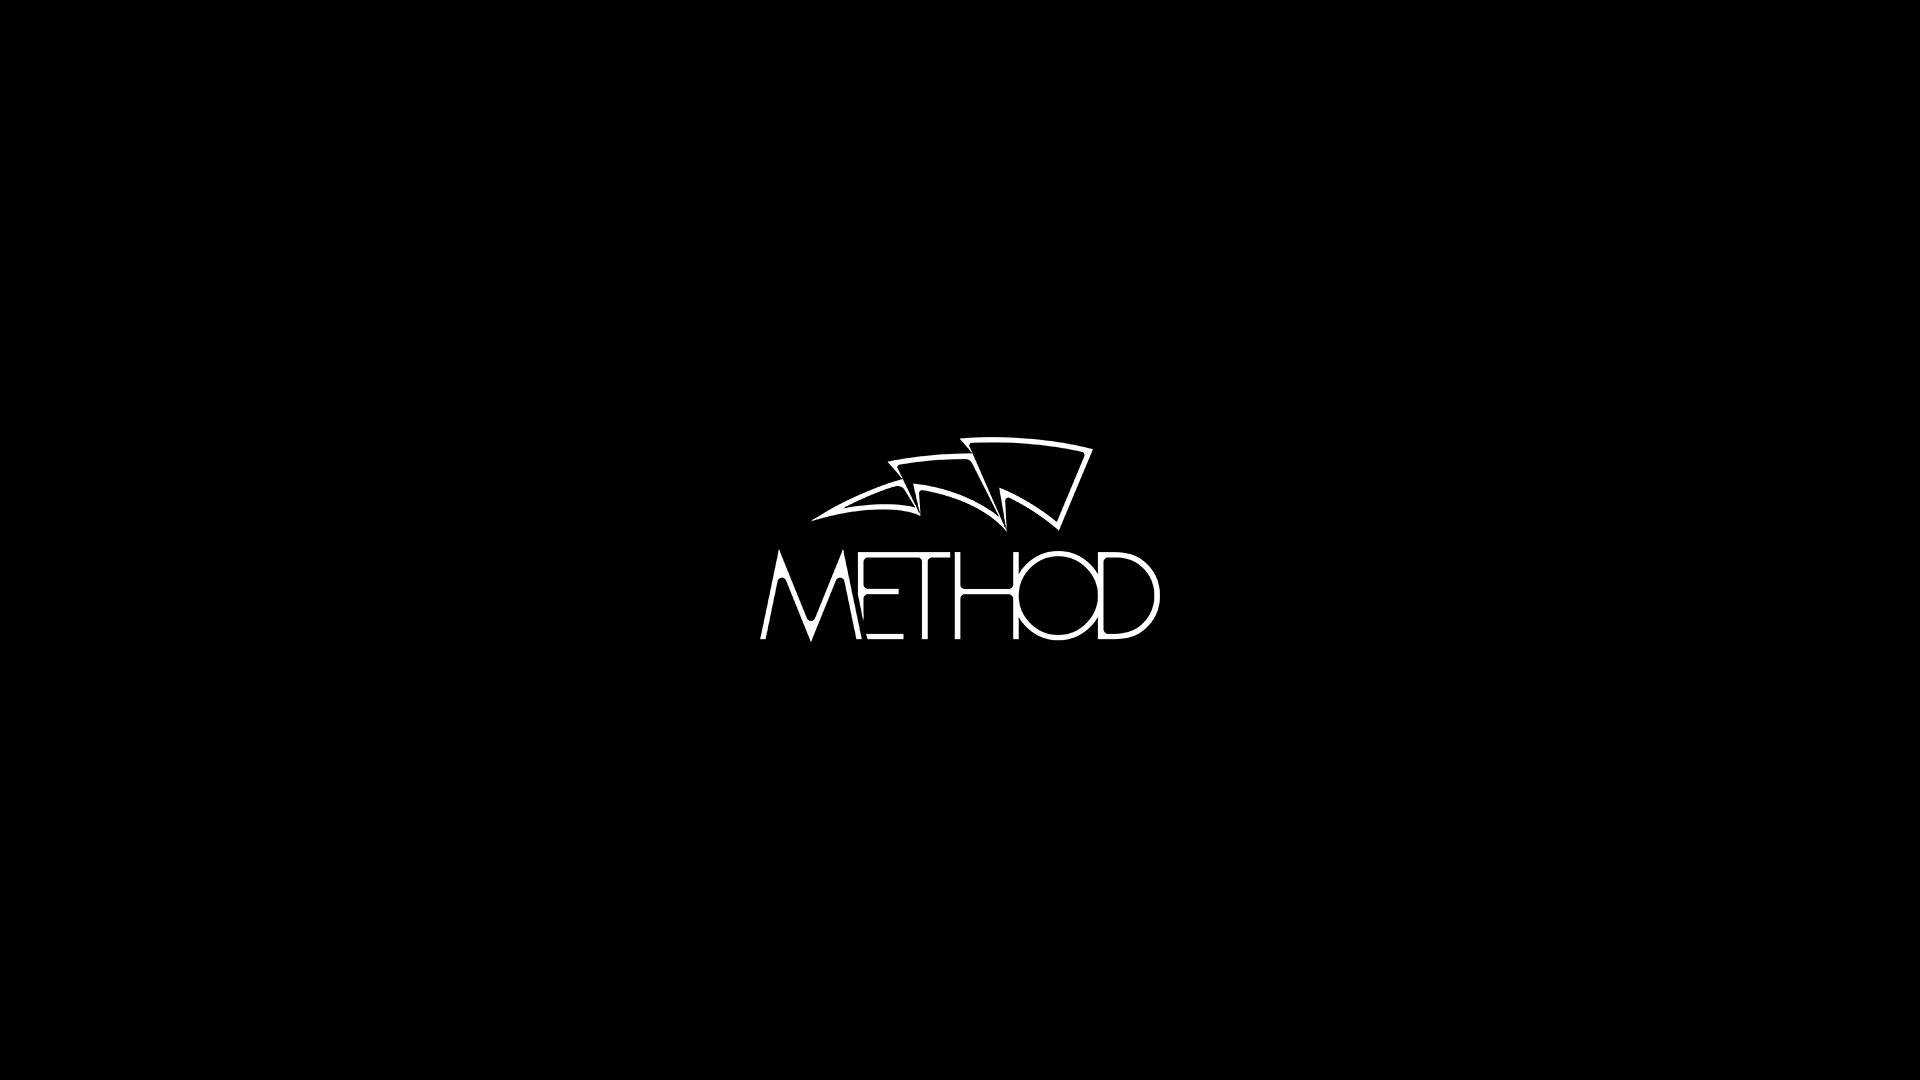 Method Agencia, web hecha por murciègalo en 2019